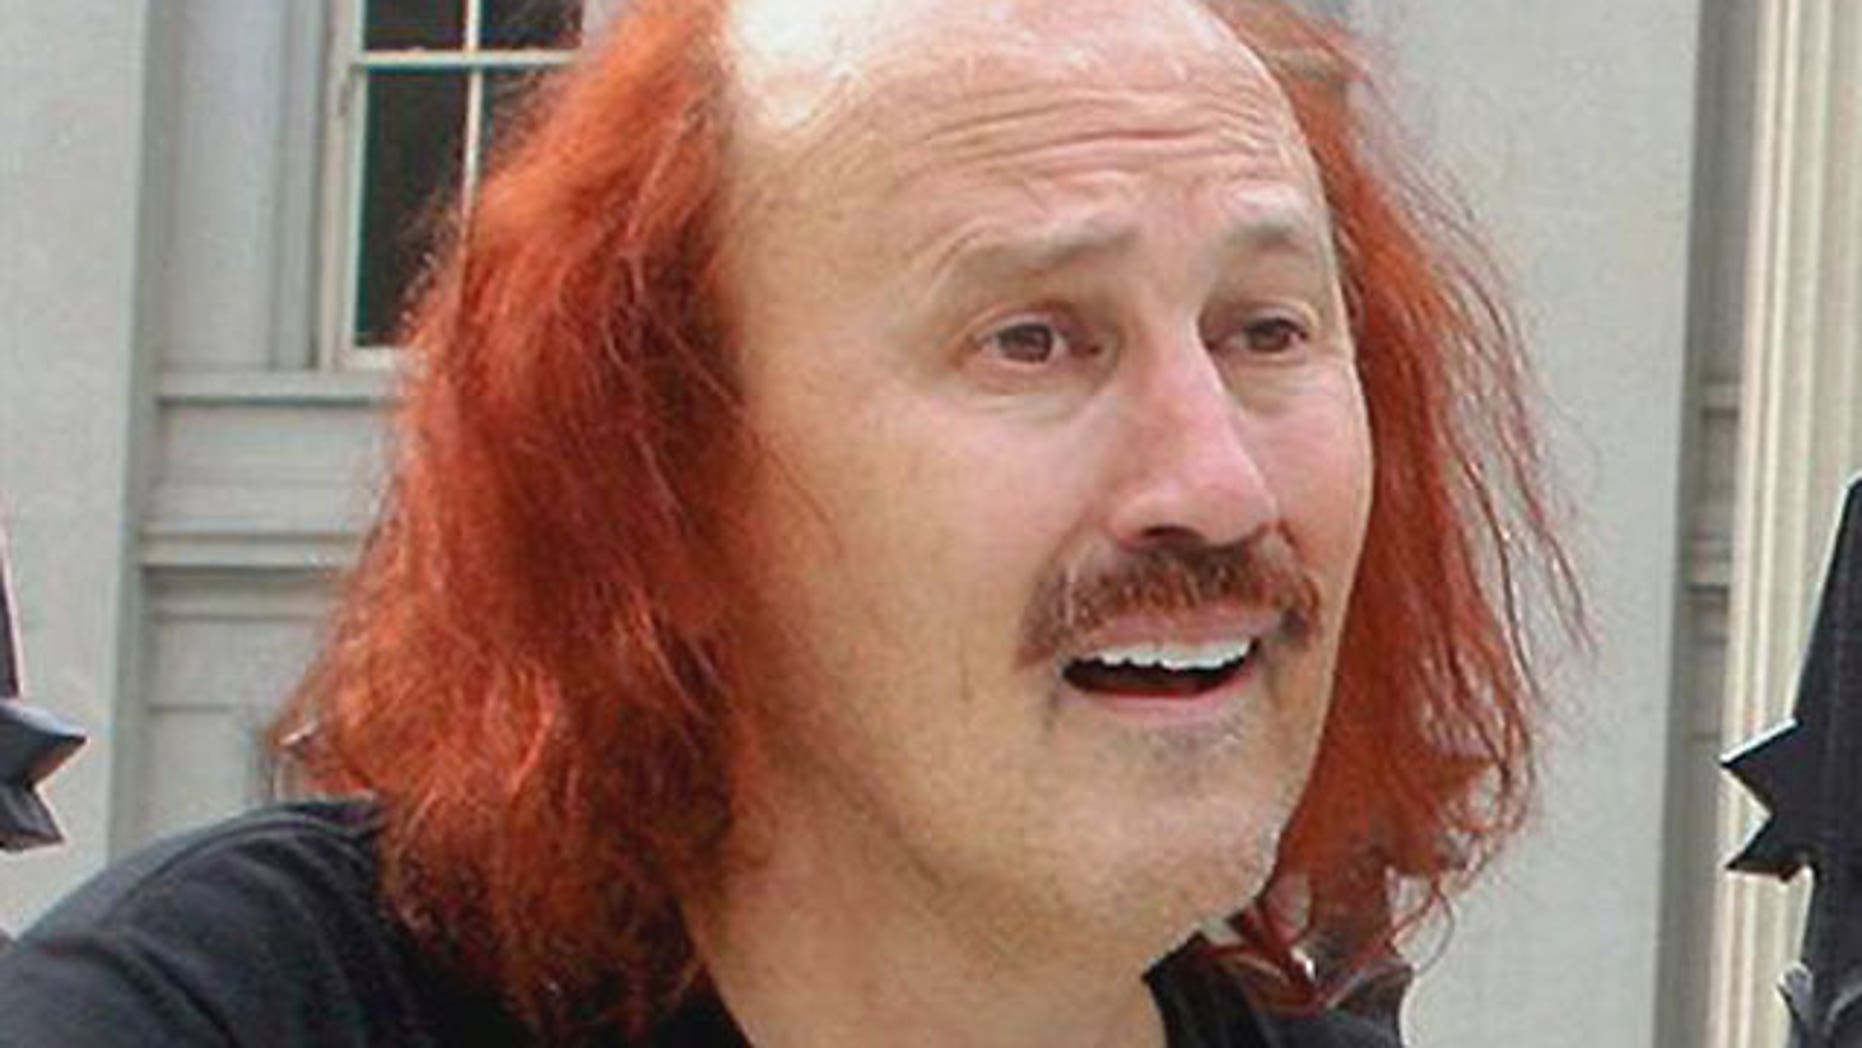 FILE: Comedian Gallagher in 2003